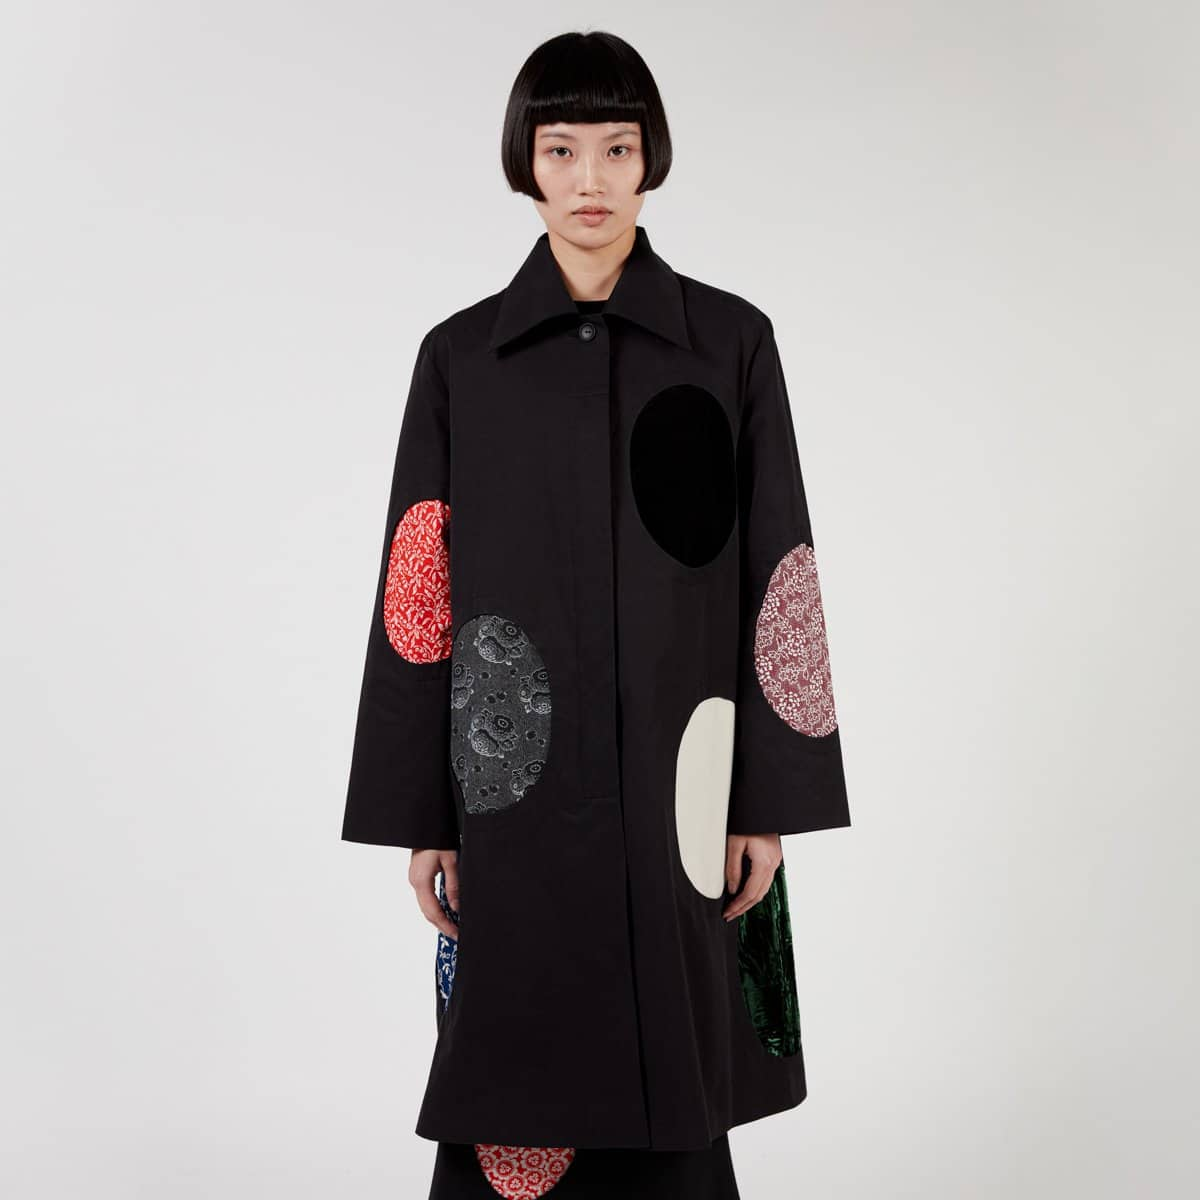 J.Kim Coat With Ovals